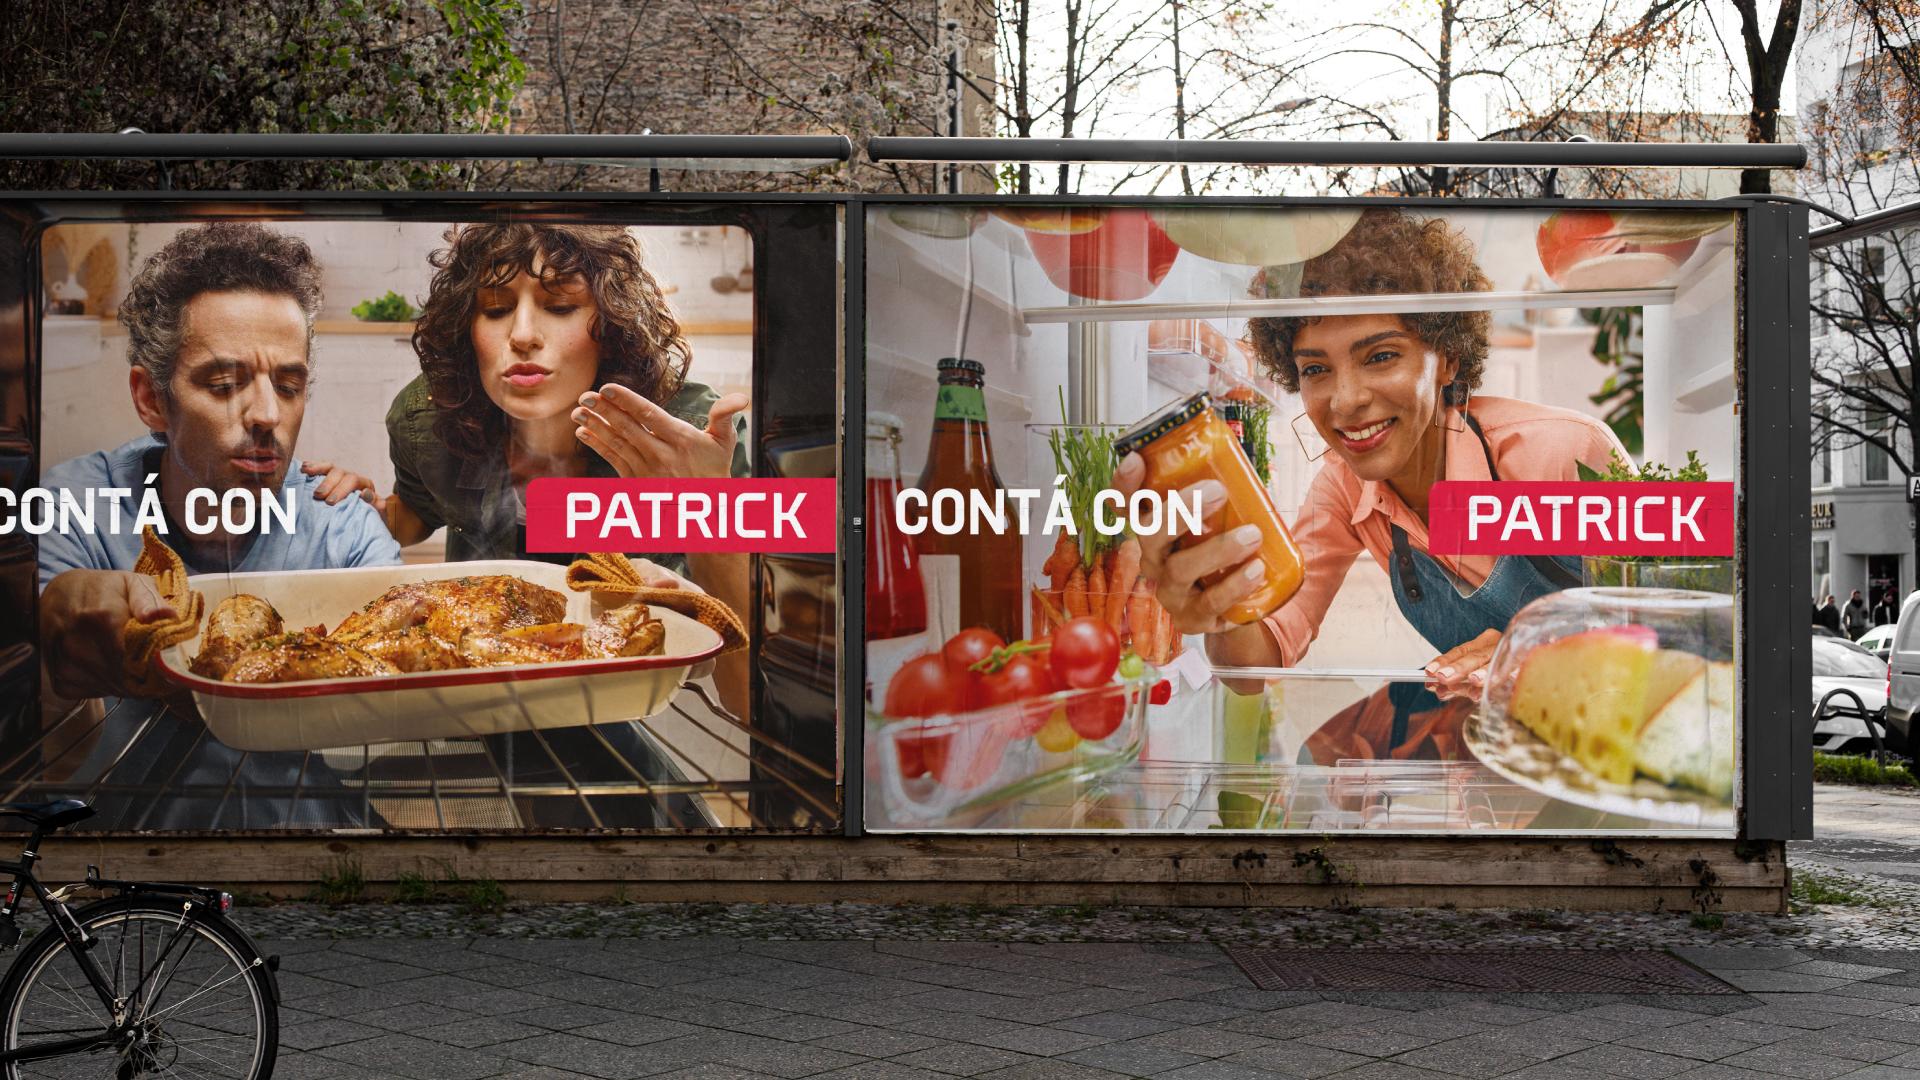 CRAVERO_WEB-PATRICK-17